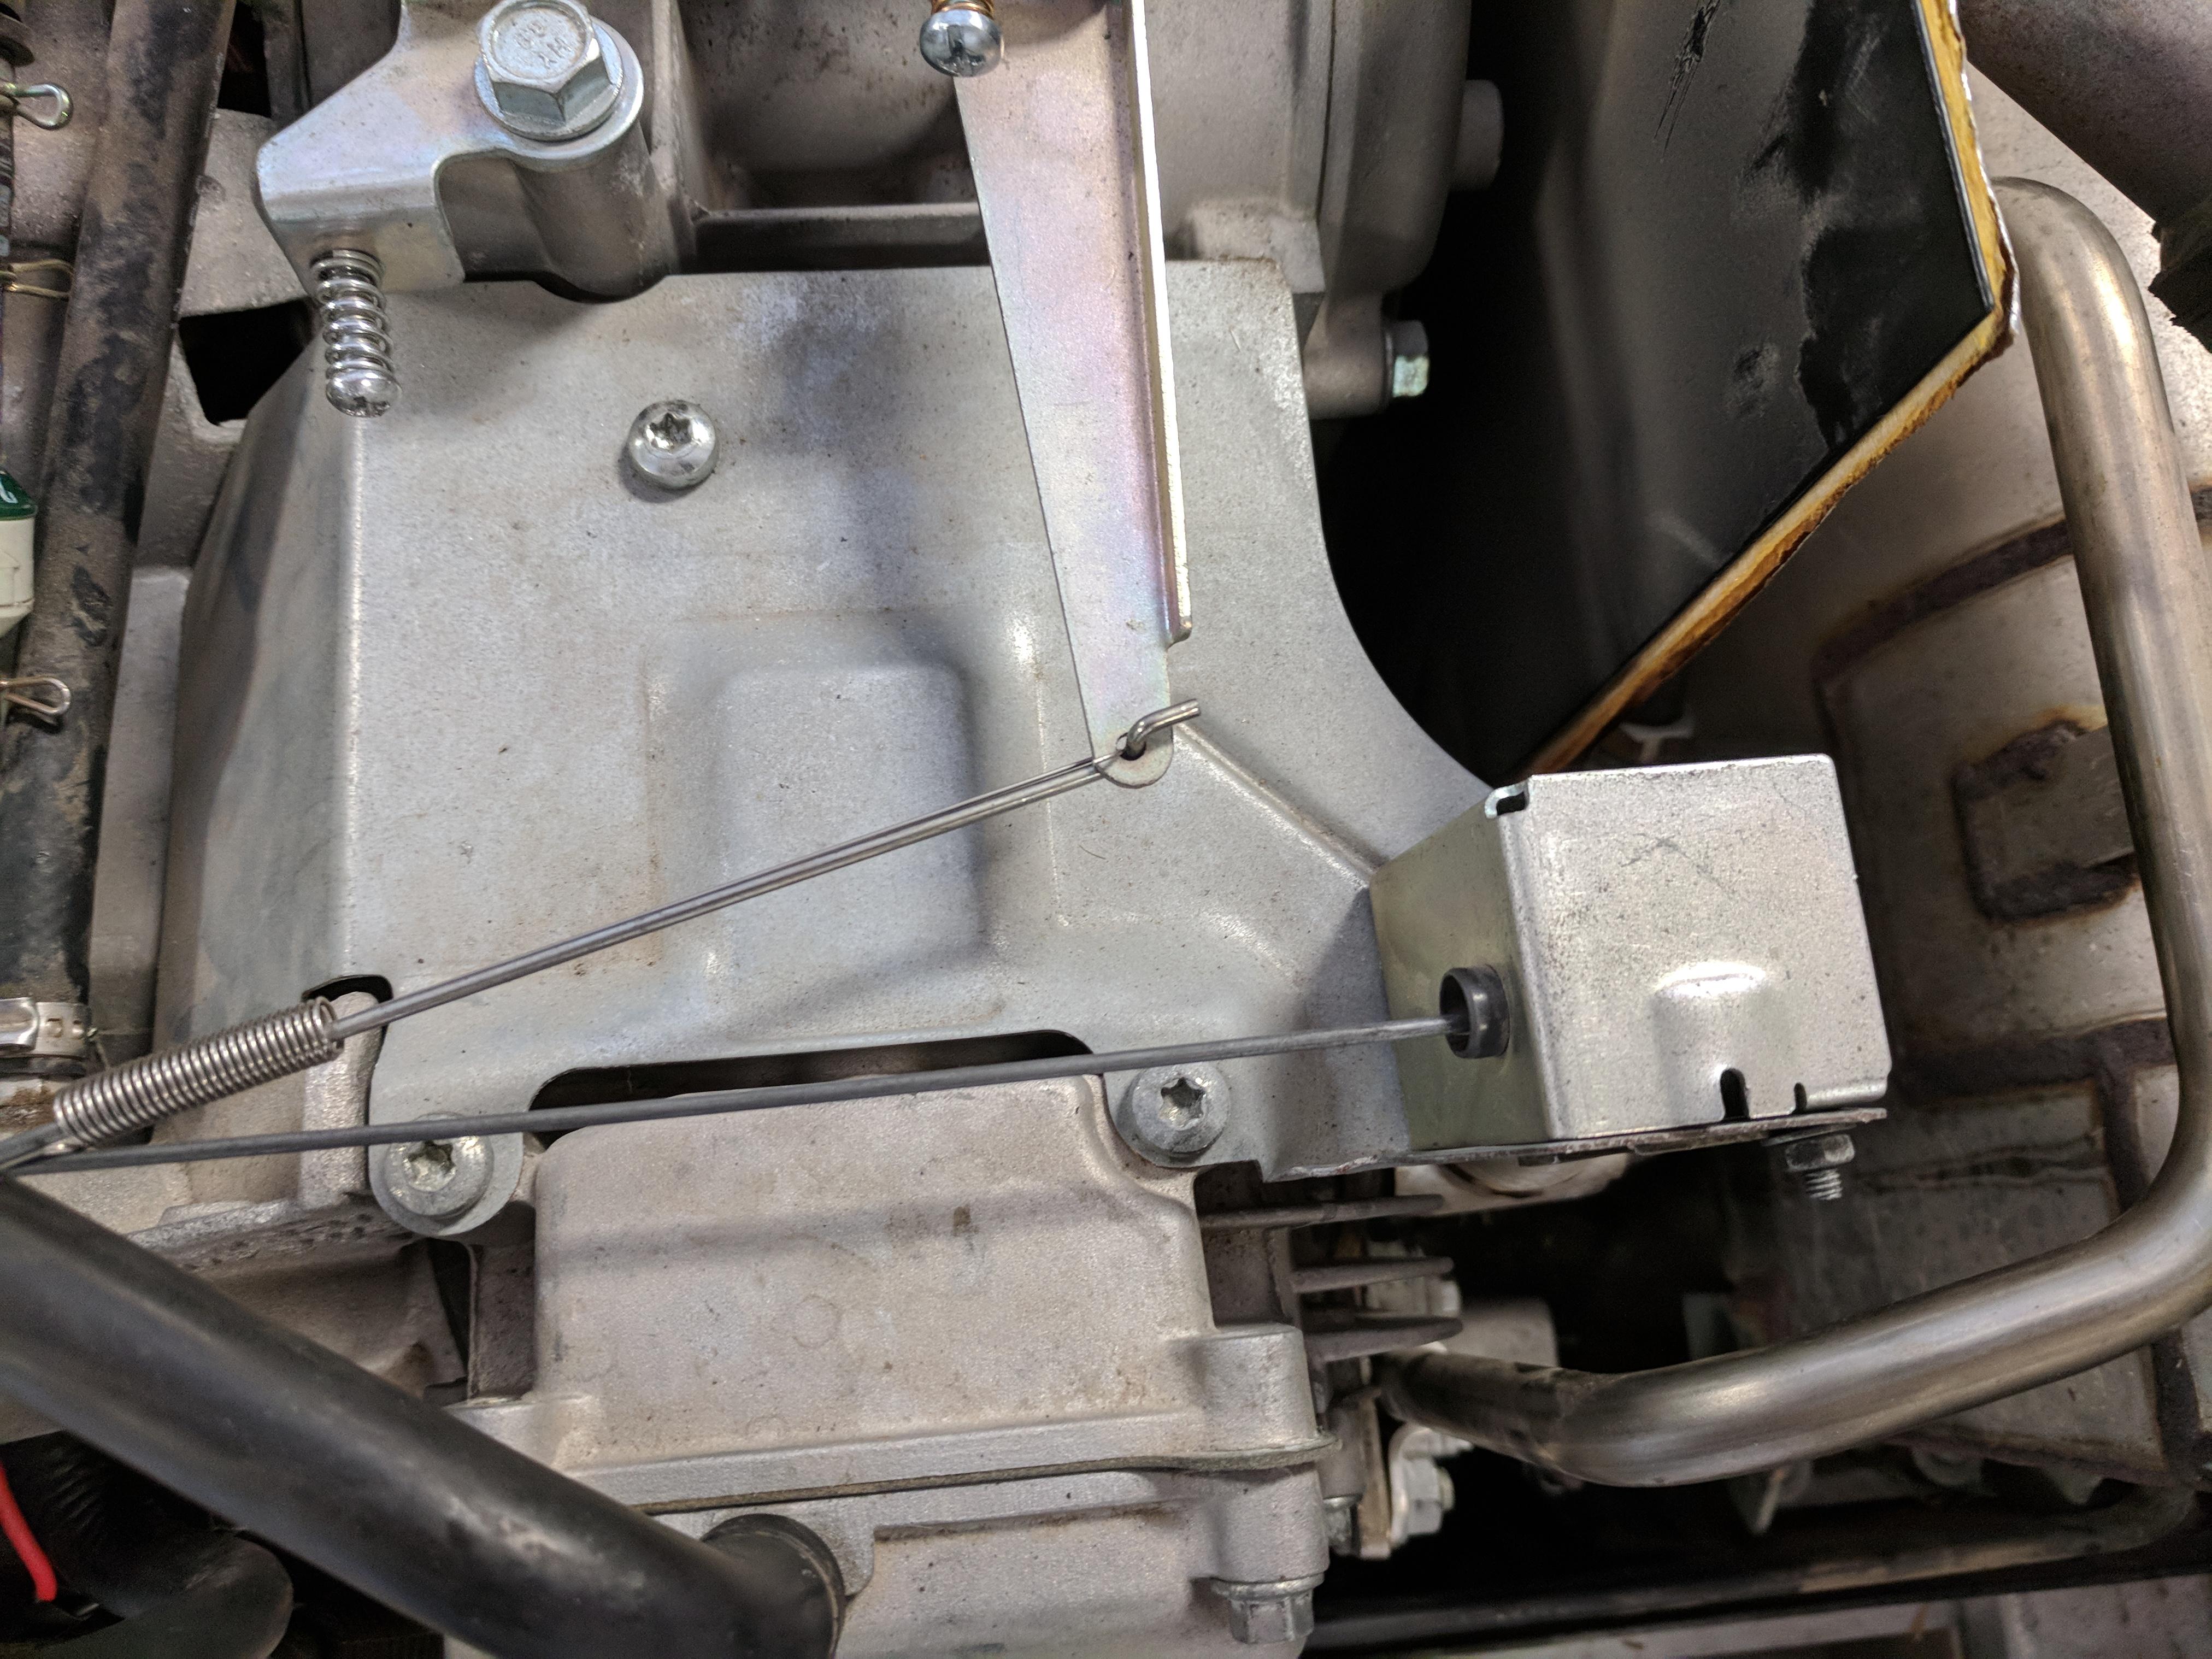 I'm working on an Onan RV QG 4000 EVAP  Modle #4kyfa-6147P